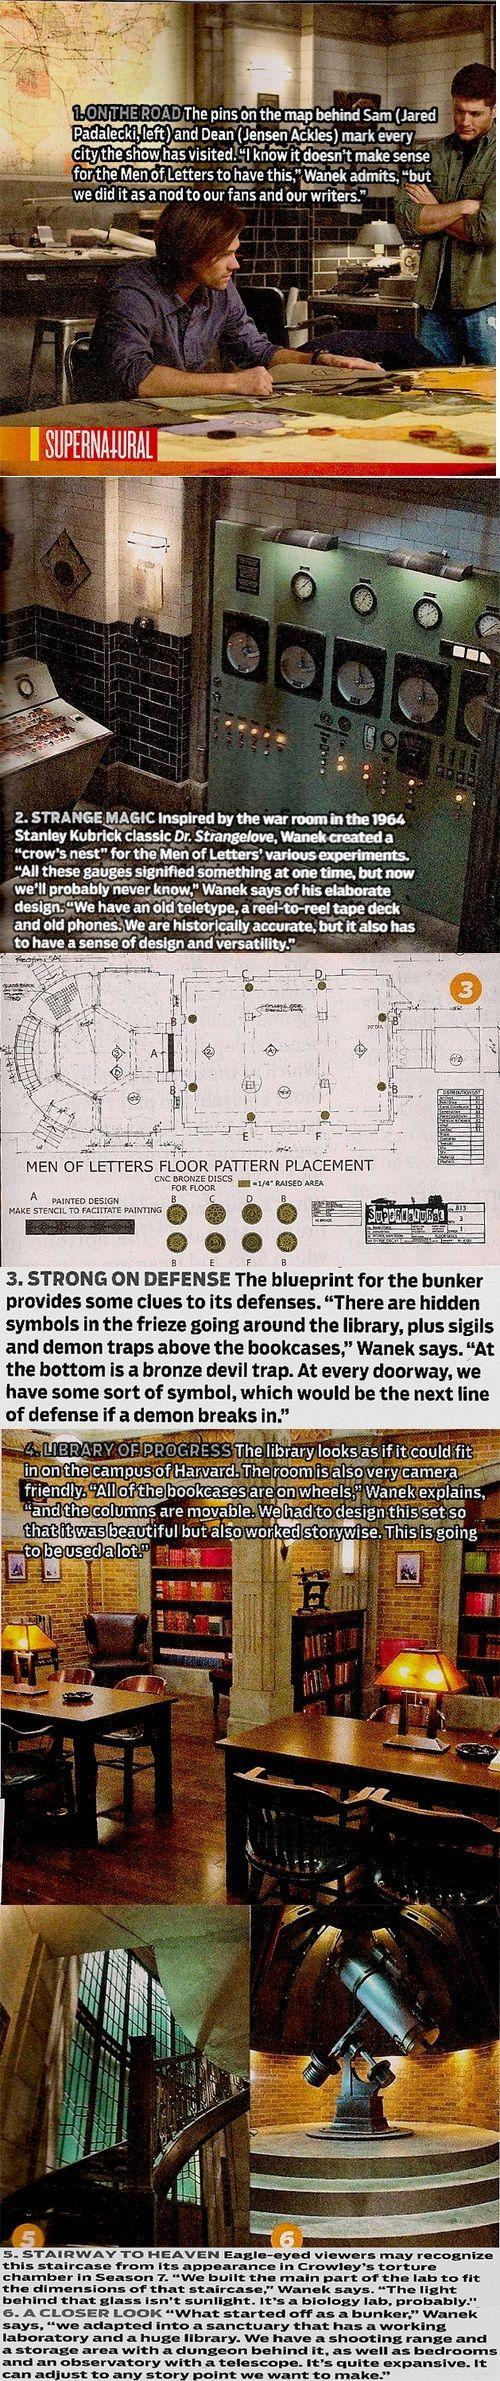 Info on the Bunker from Wanek